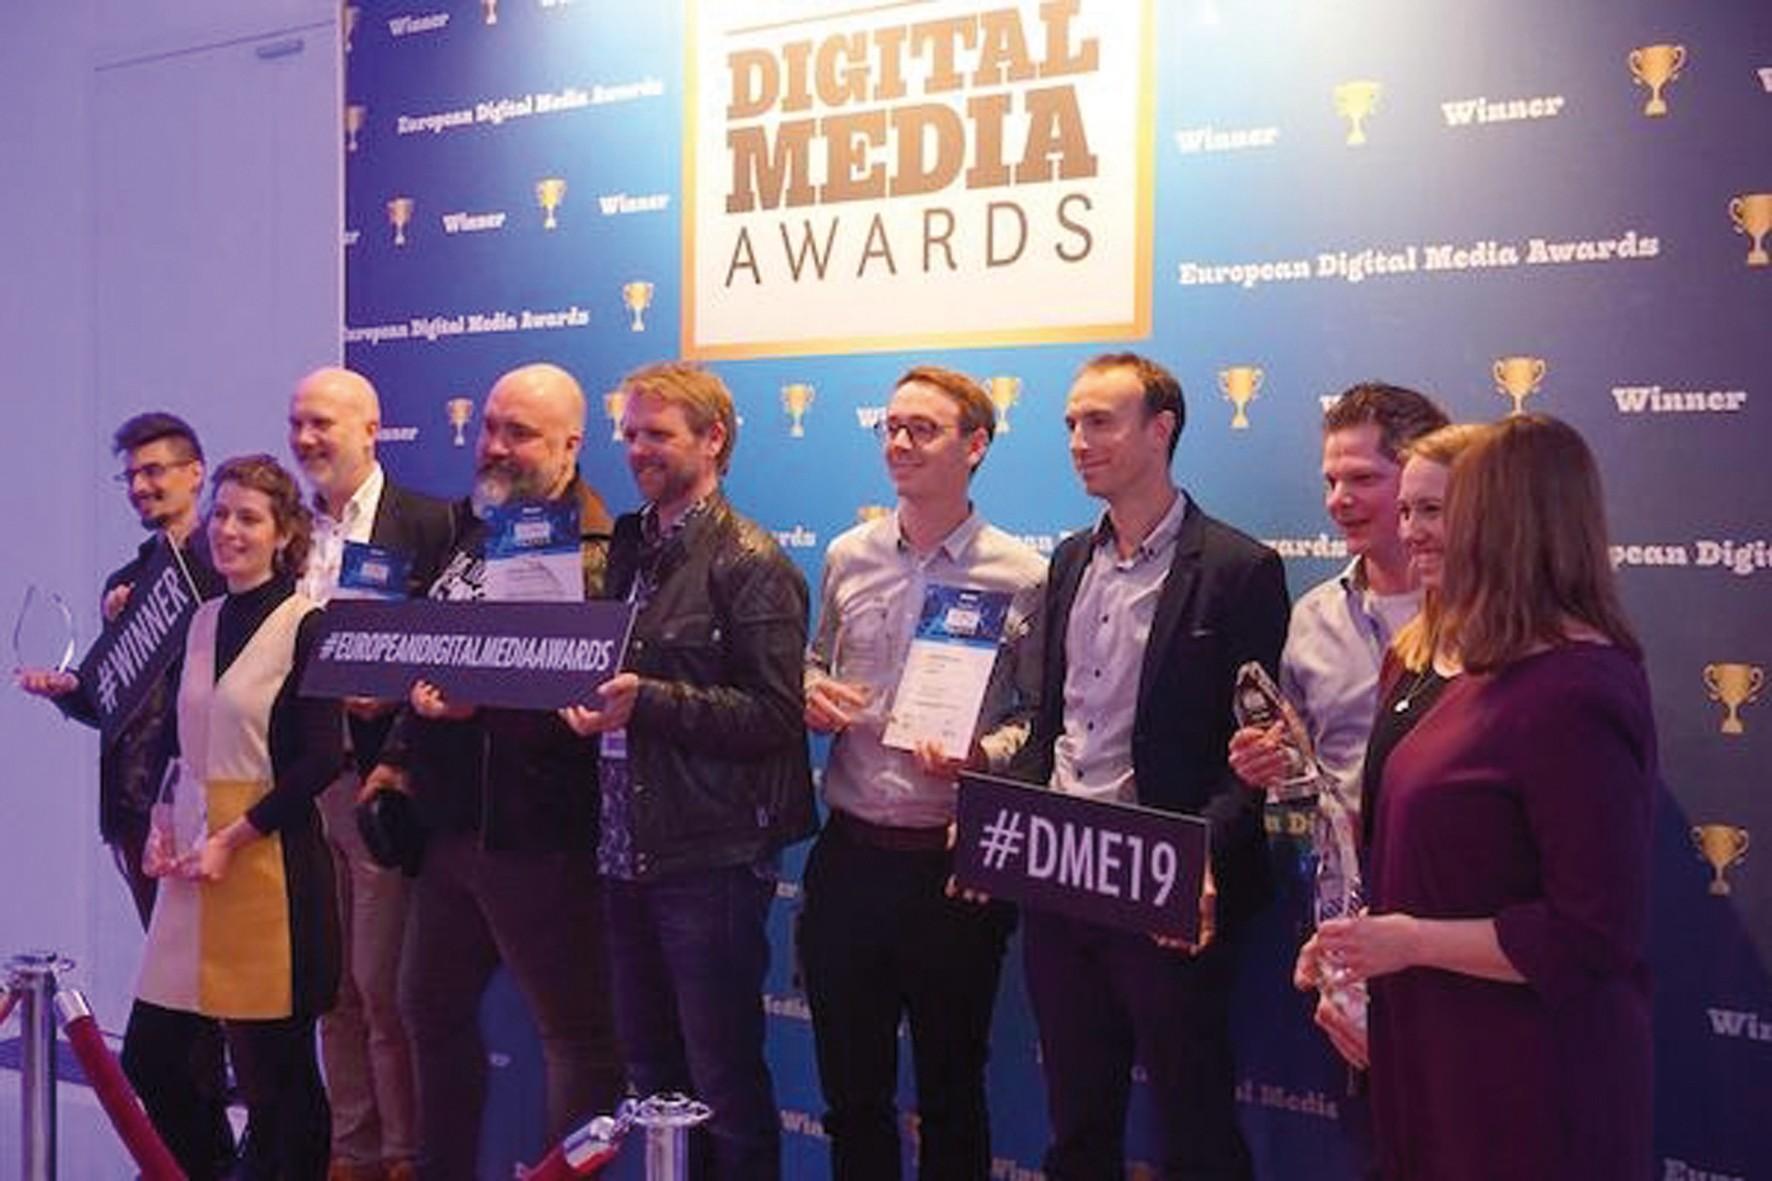 Vencedores do WAN-IFRA European Digital Media Awards